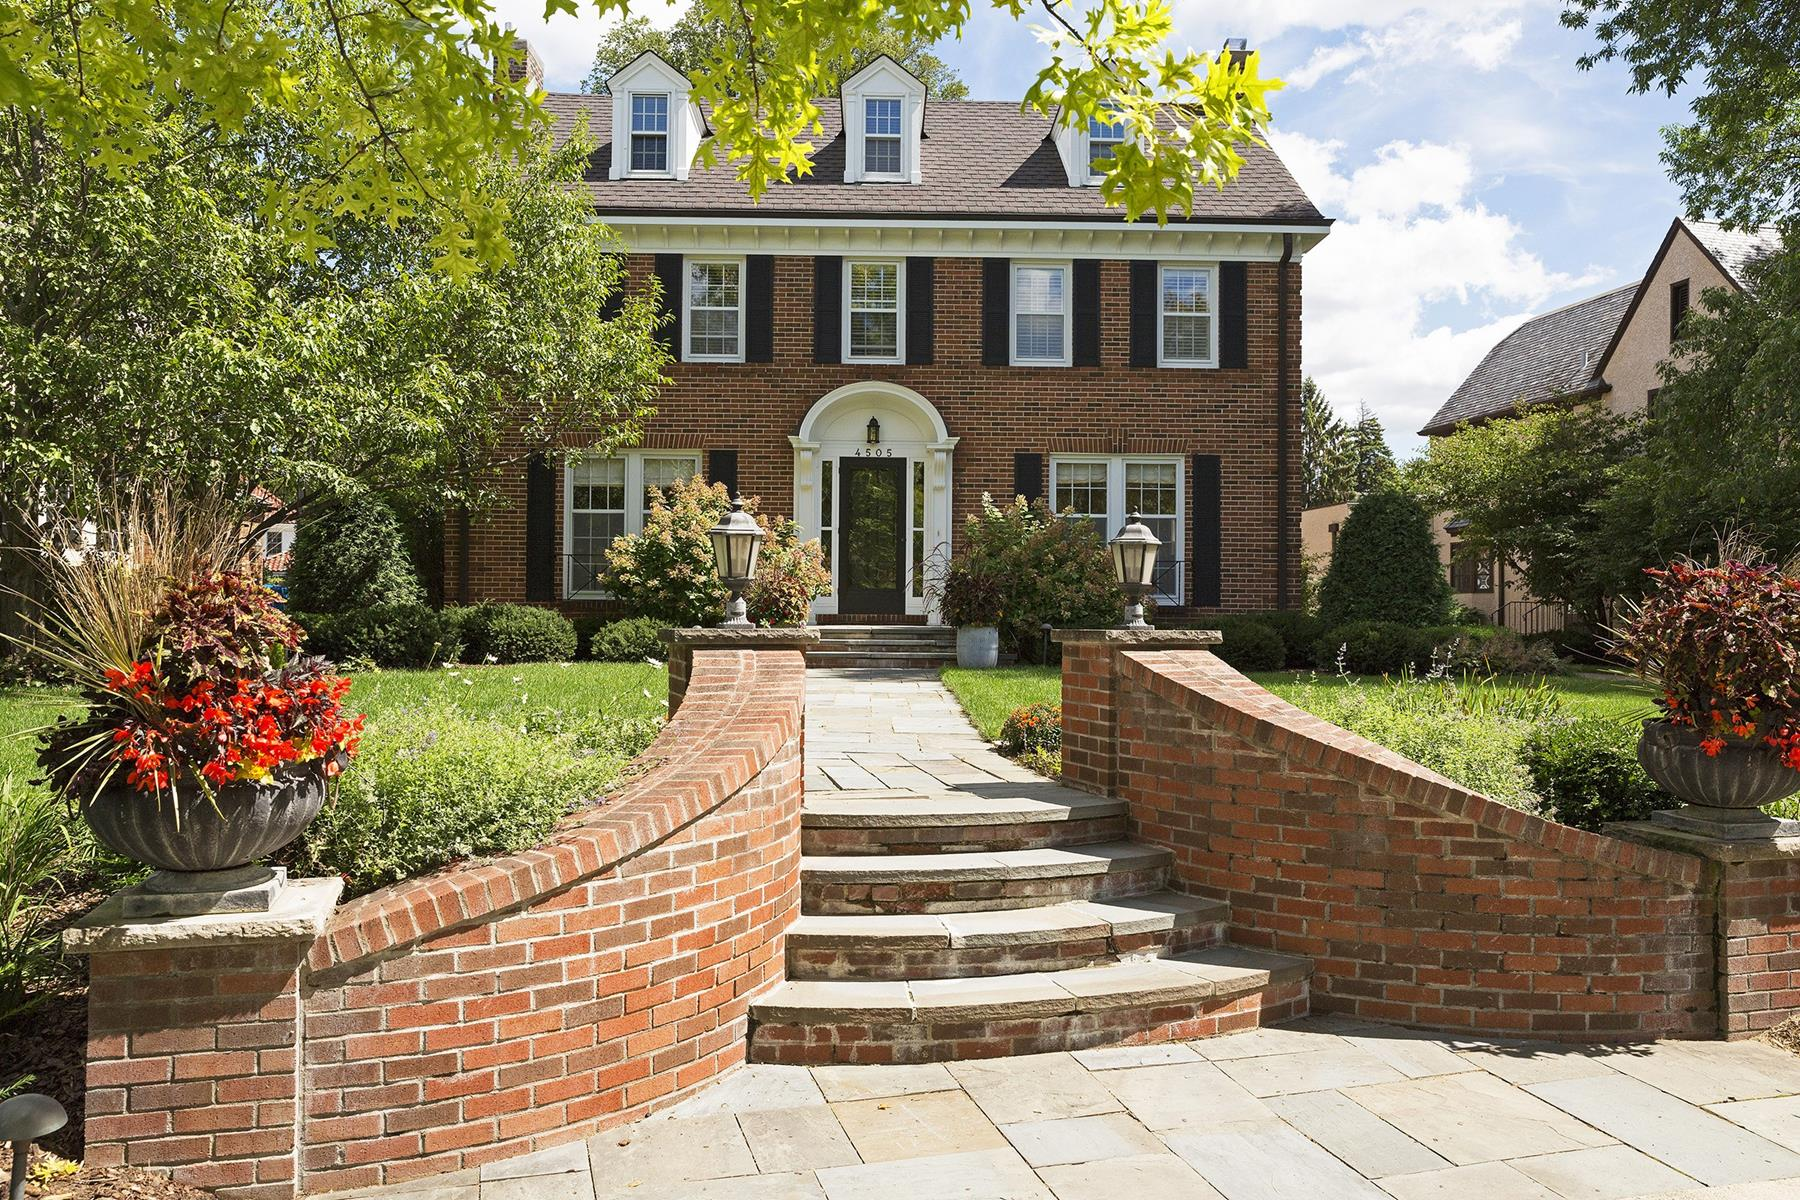 Villa per Vendita alle ore 4505 Edina Boulevard Edina, Minnesota, 55424 Stati Uniti